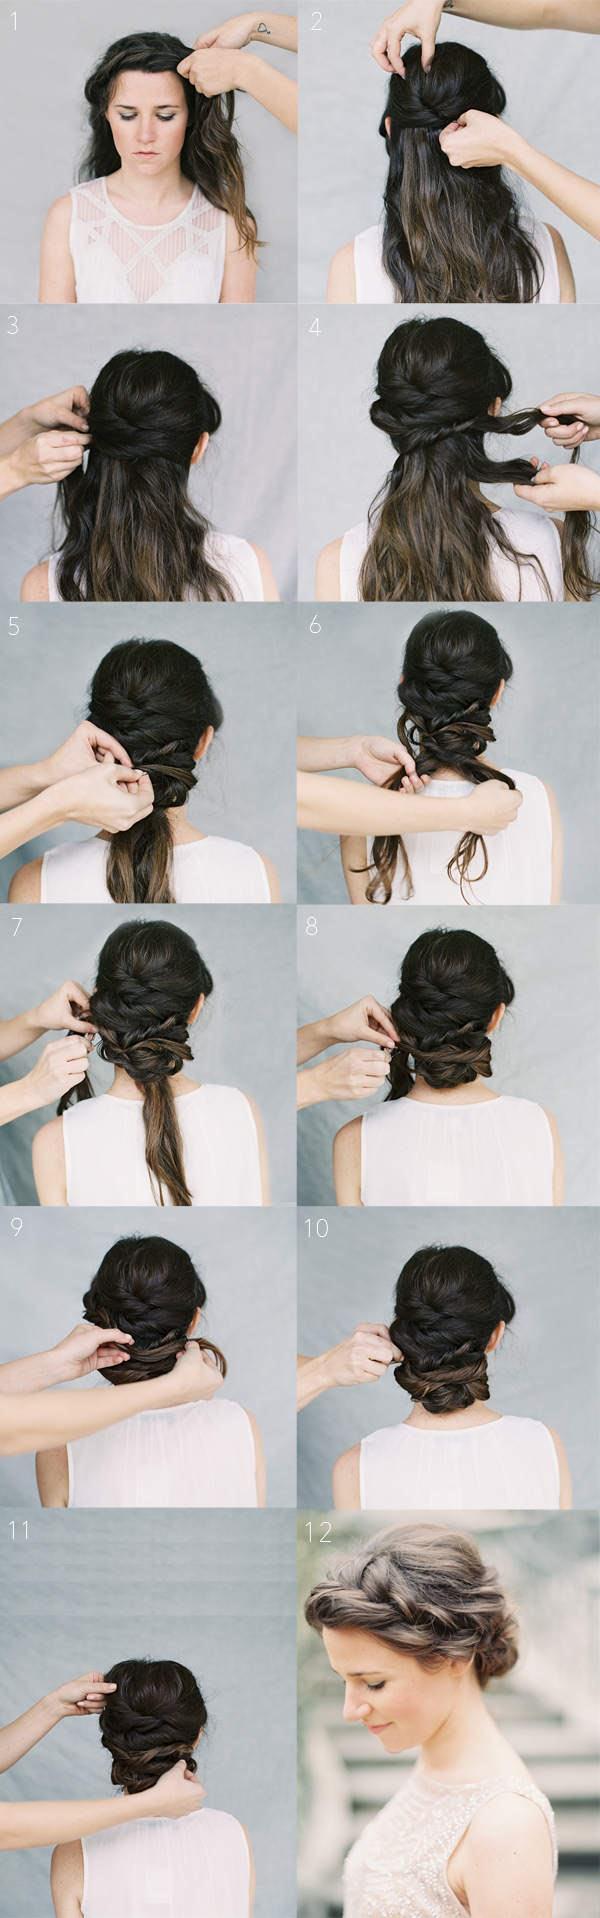 24easy-updos-for-long-hair-100416